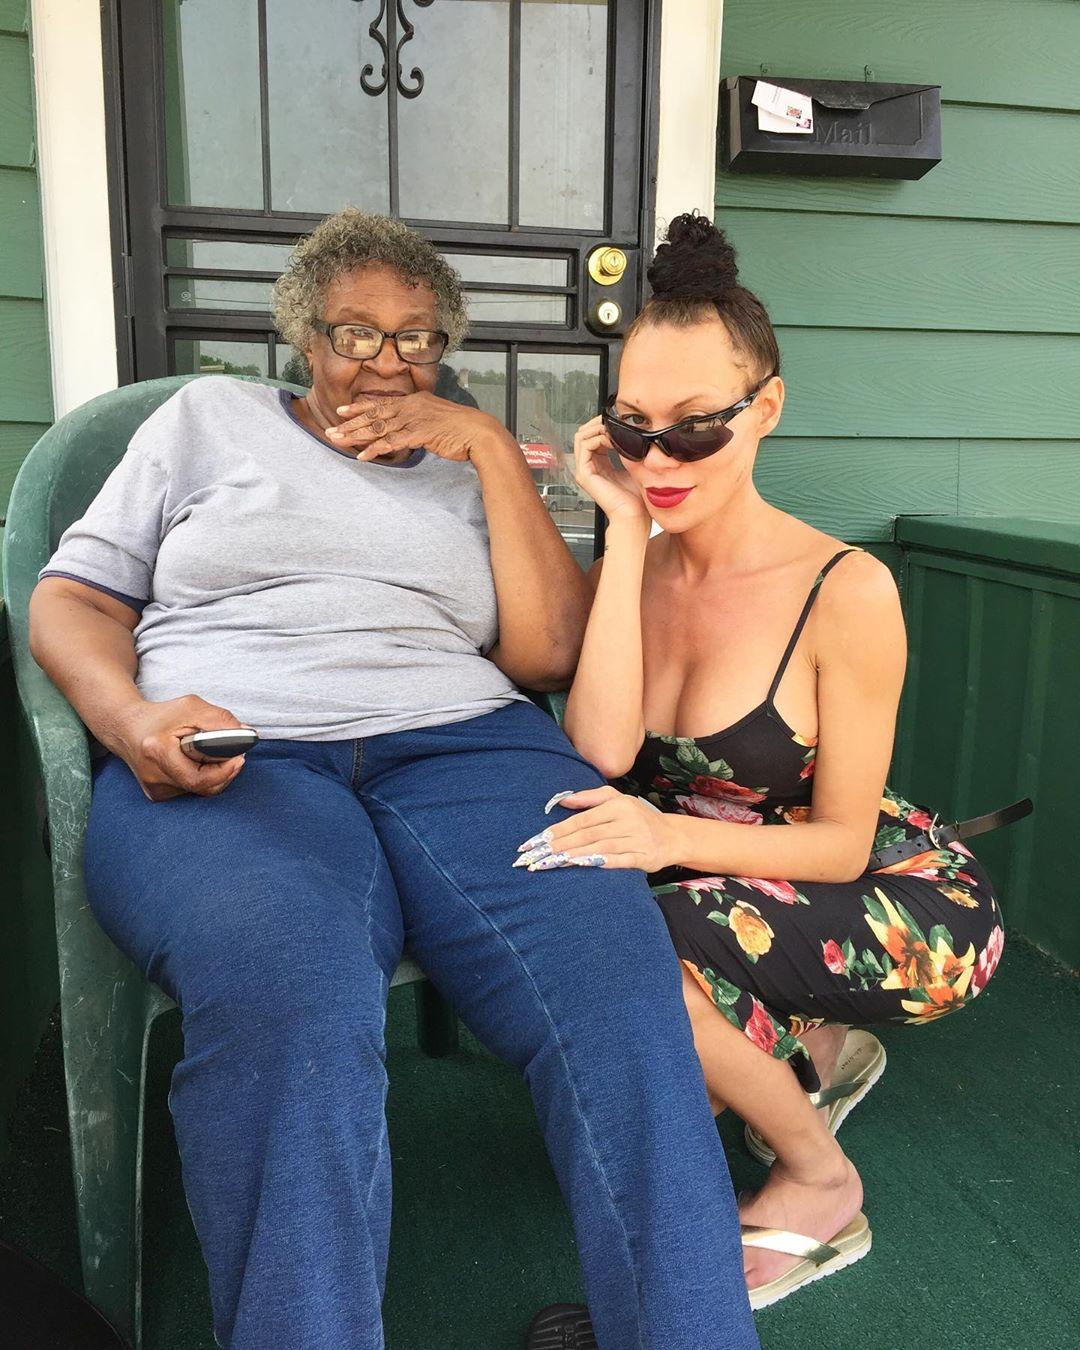 Mia Isabella porch sitting